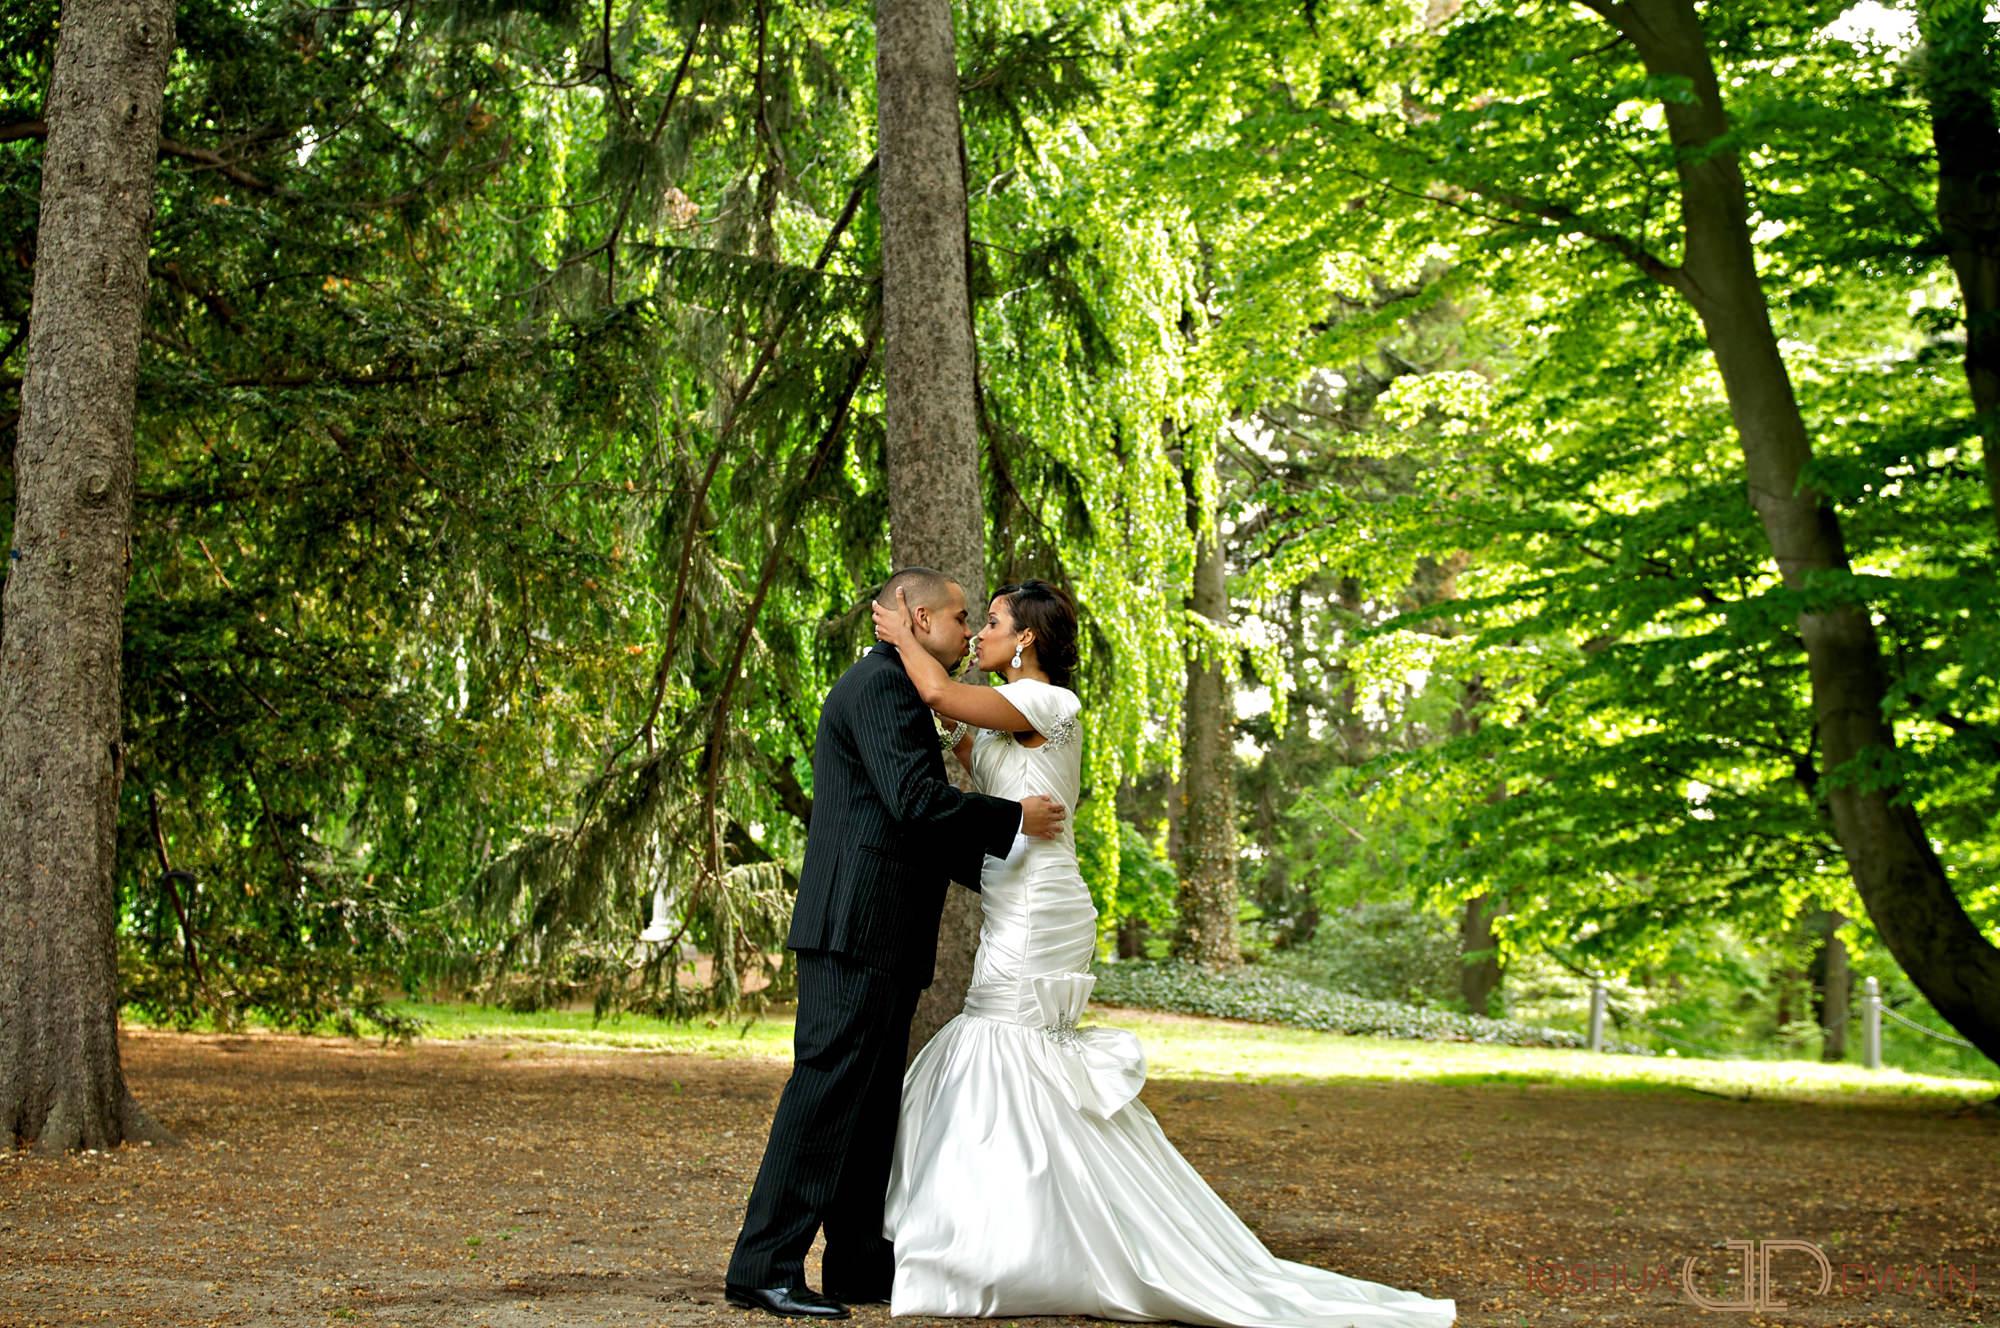 carolina-hector-008-chateau-briandlong-island-new-york-wedding-photographer-joshua-dwain-2011-05-13_ch_0337